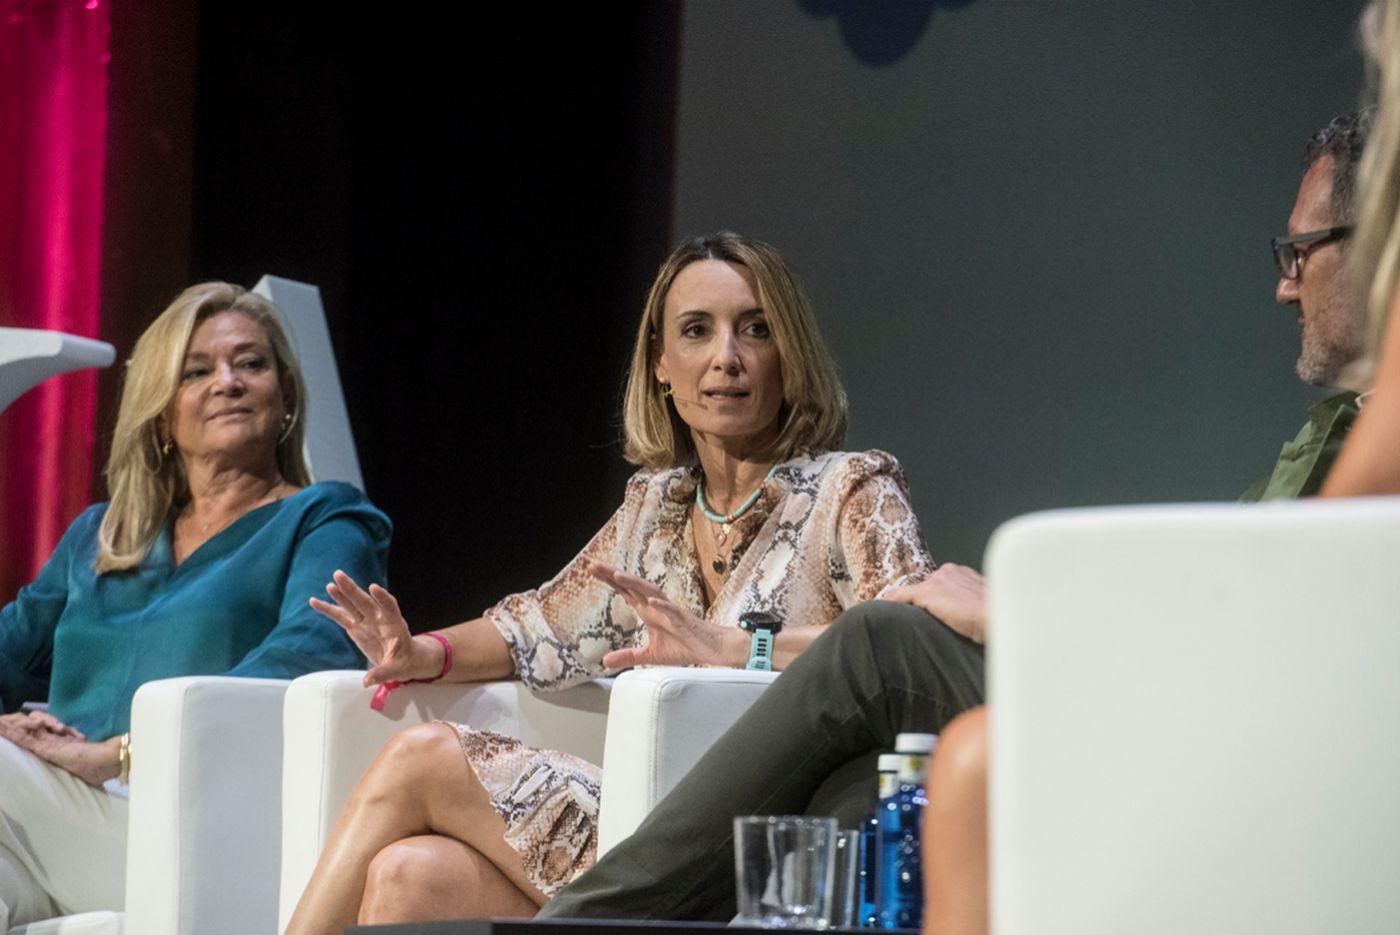 Patri Psicóloga, columnista de TELVA.com. A su derecha, Elena Pérez, cofundadora de Futurlife 21.